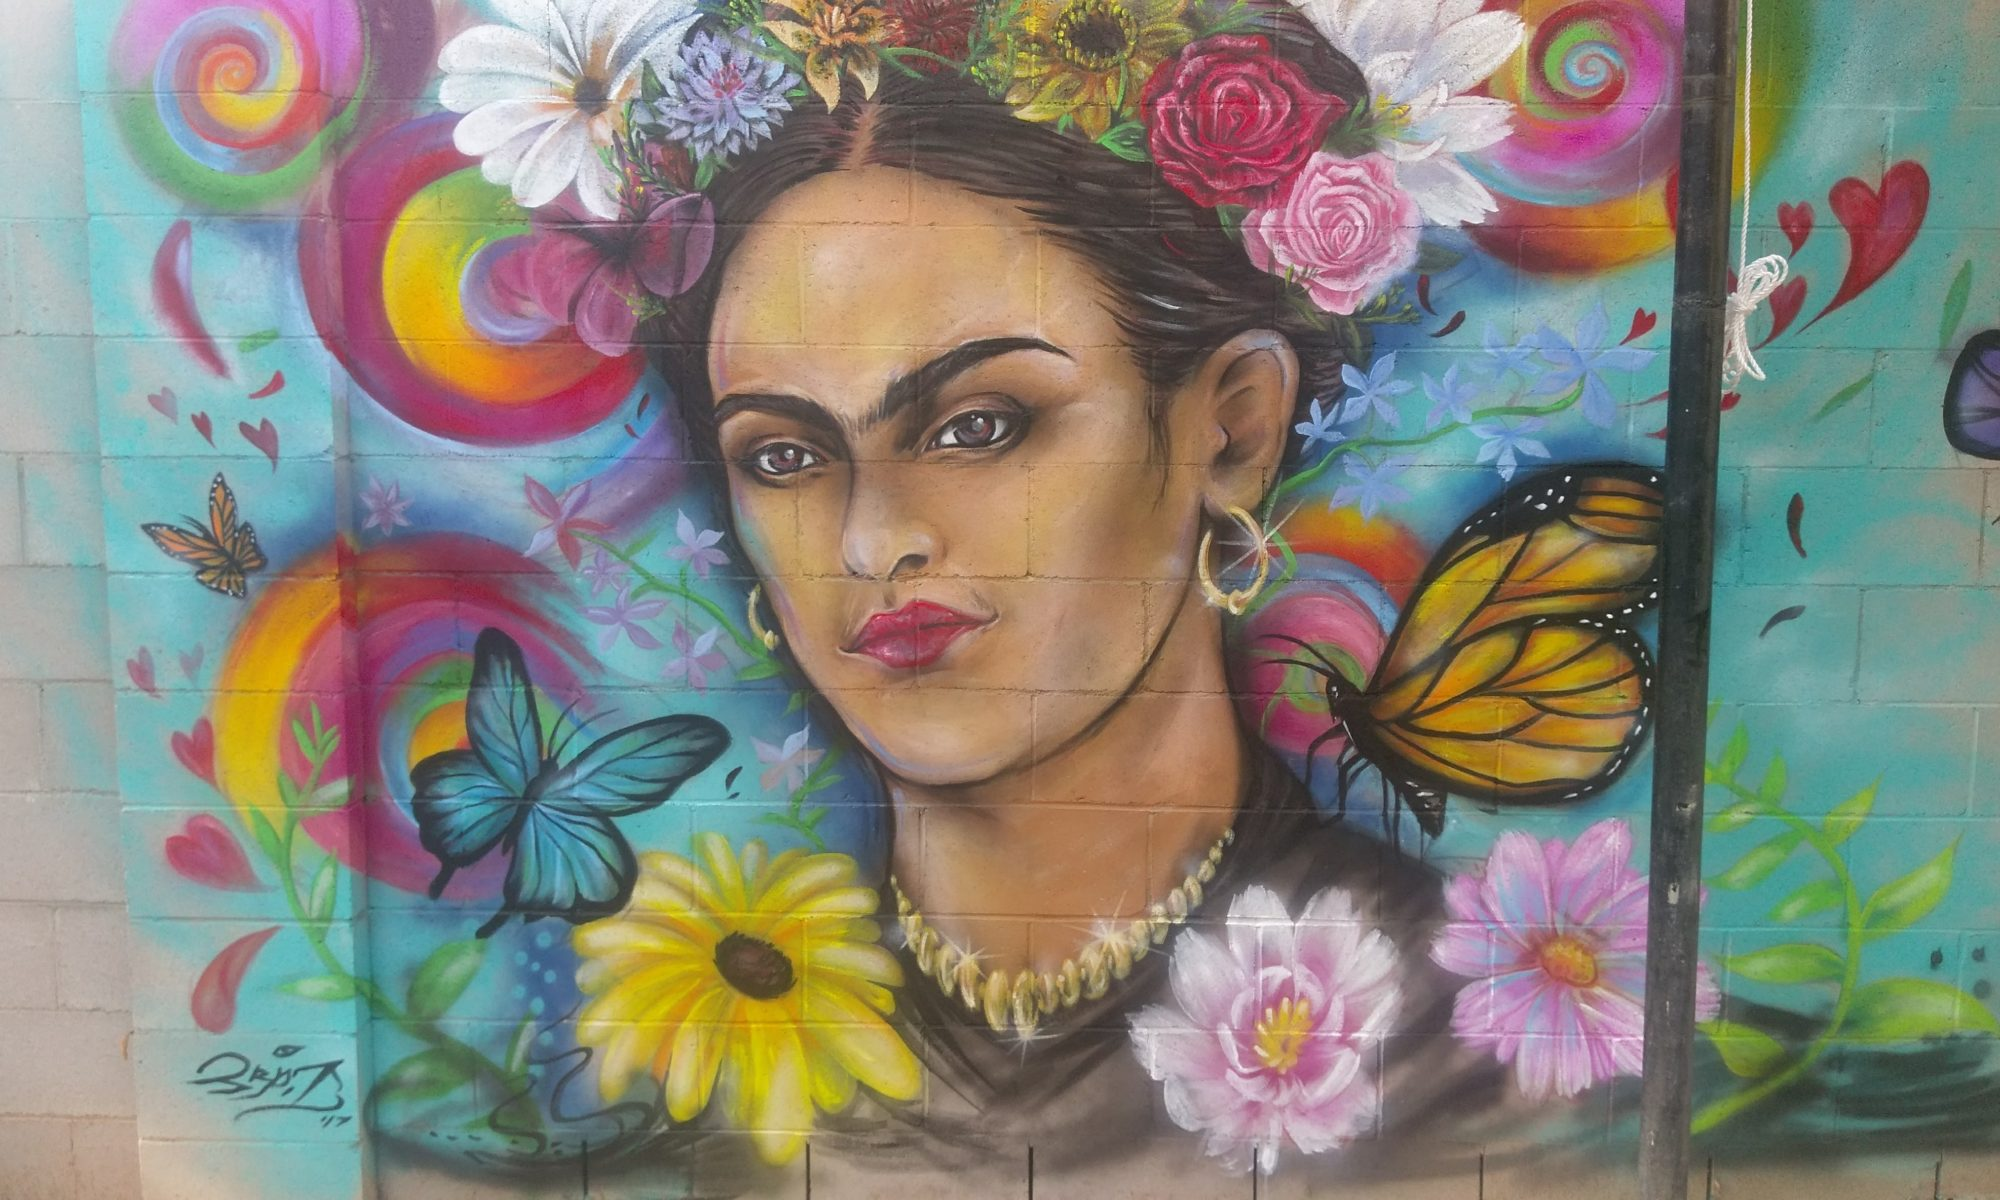 mural portrait of Frida Kahlo